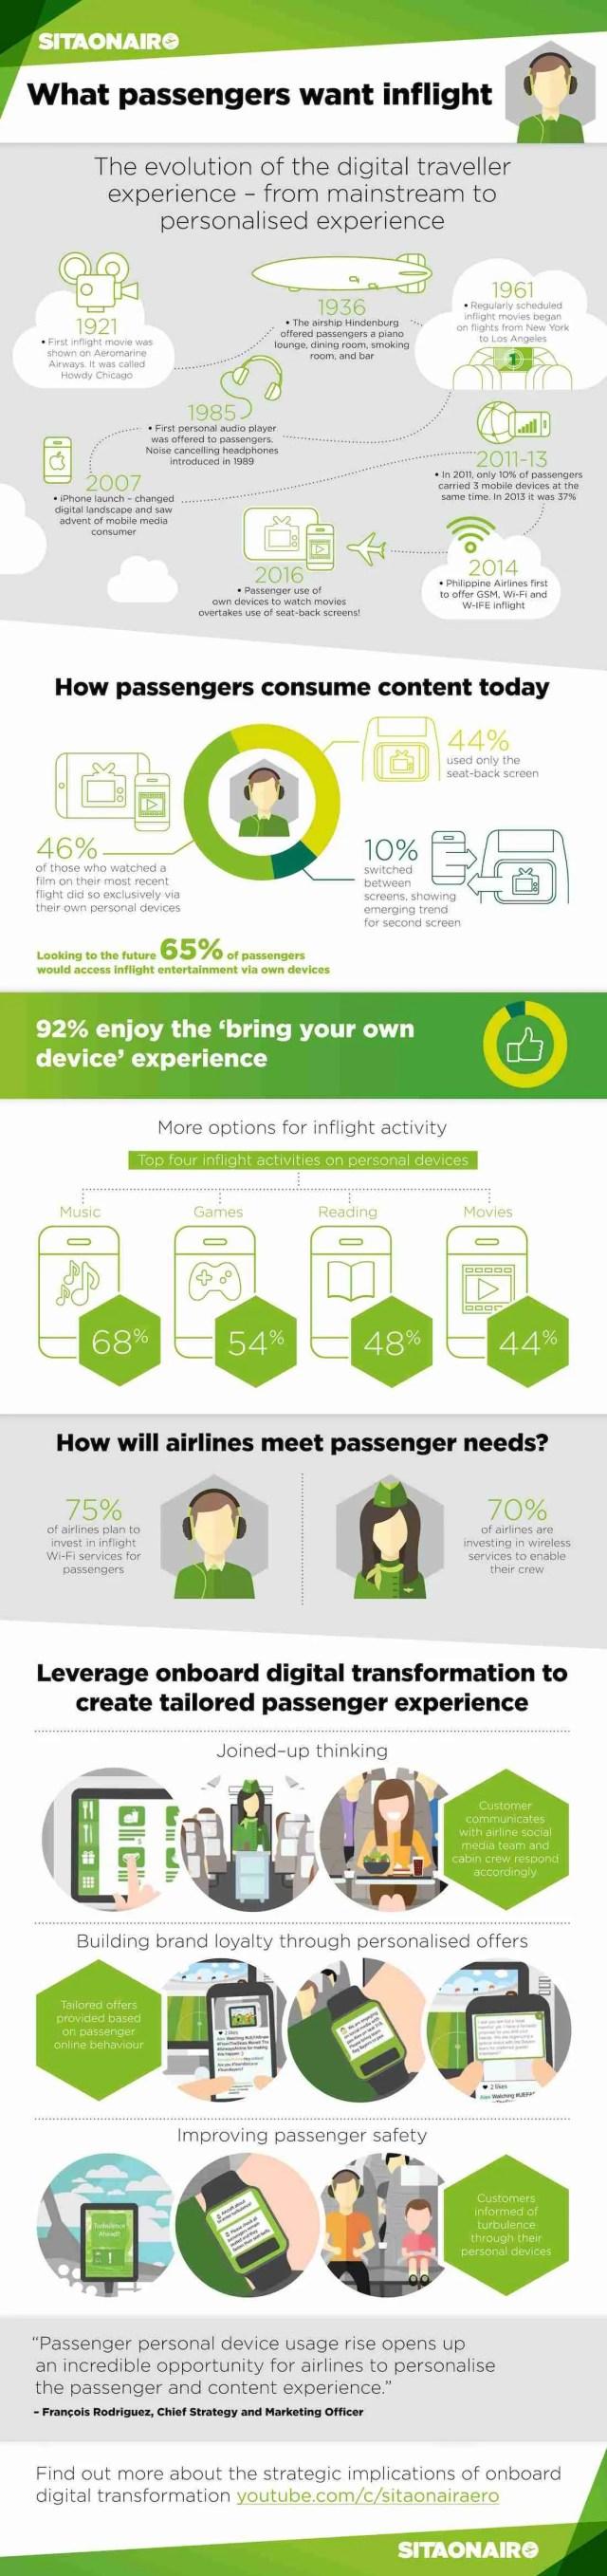 SITA Infographic